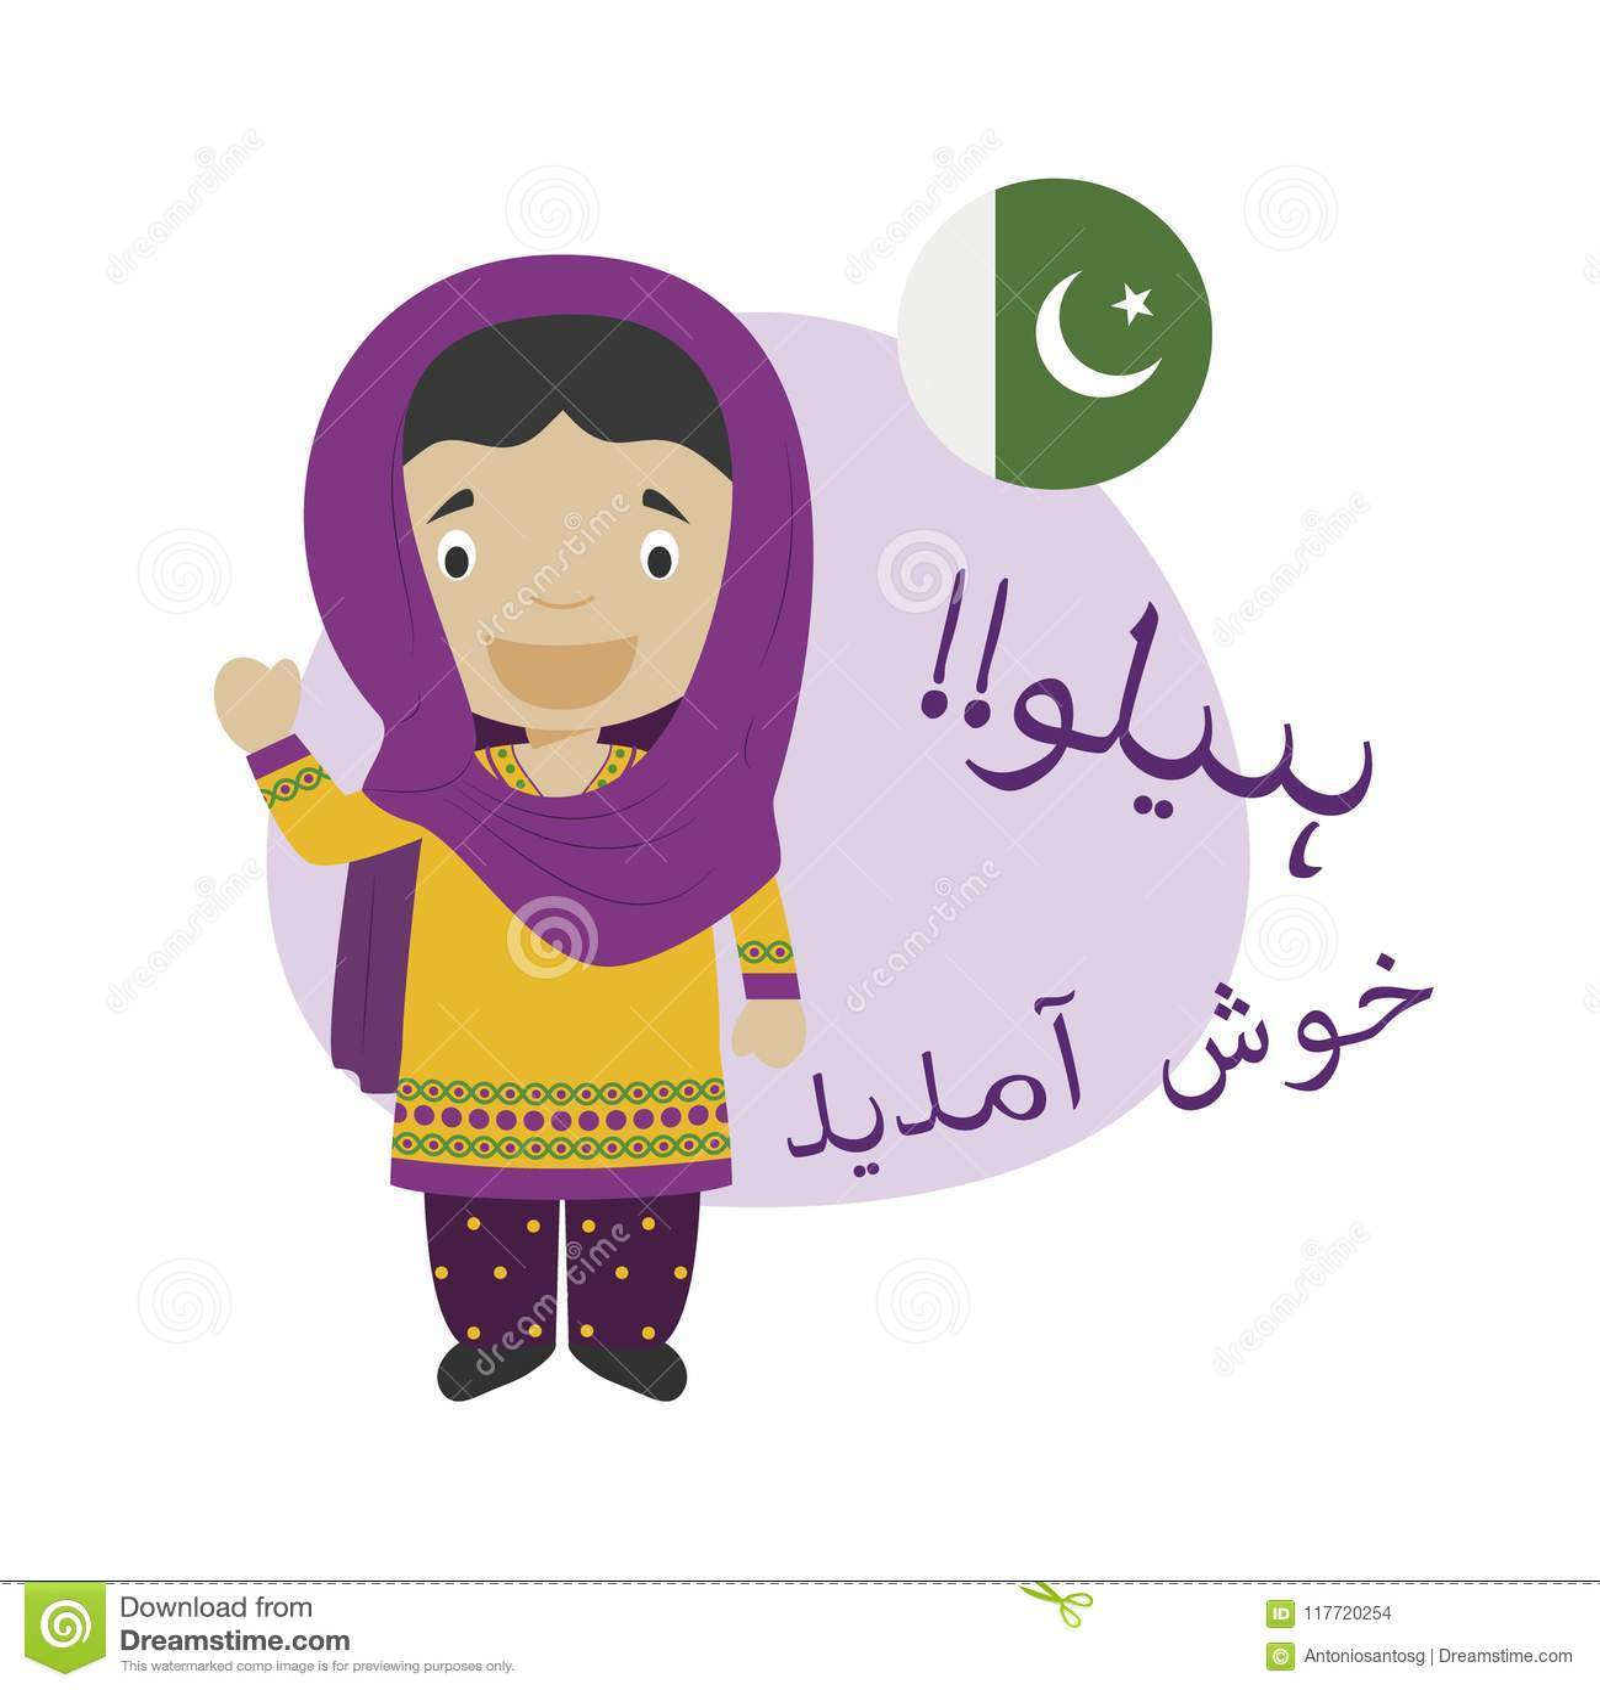 Vector Illustration Of Cartoon Character Saying Hello And